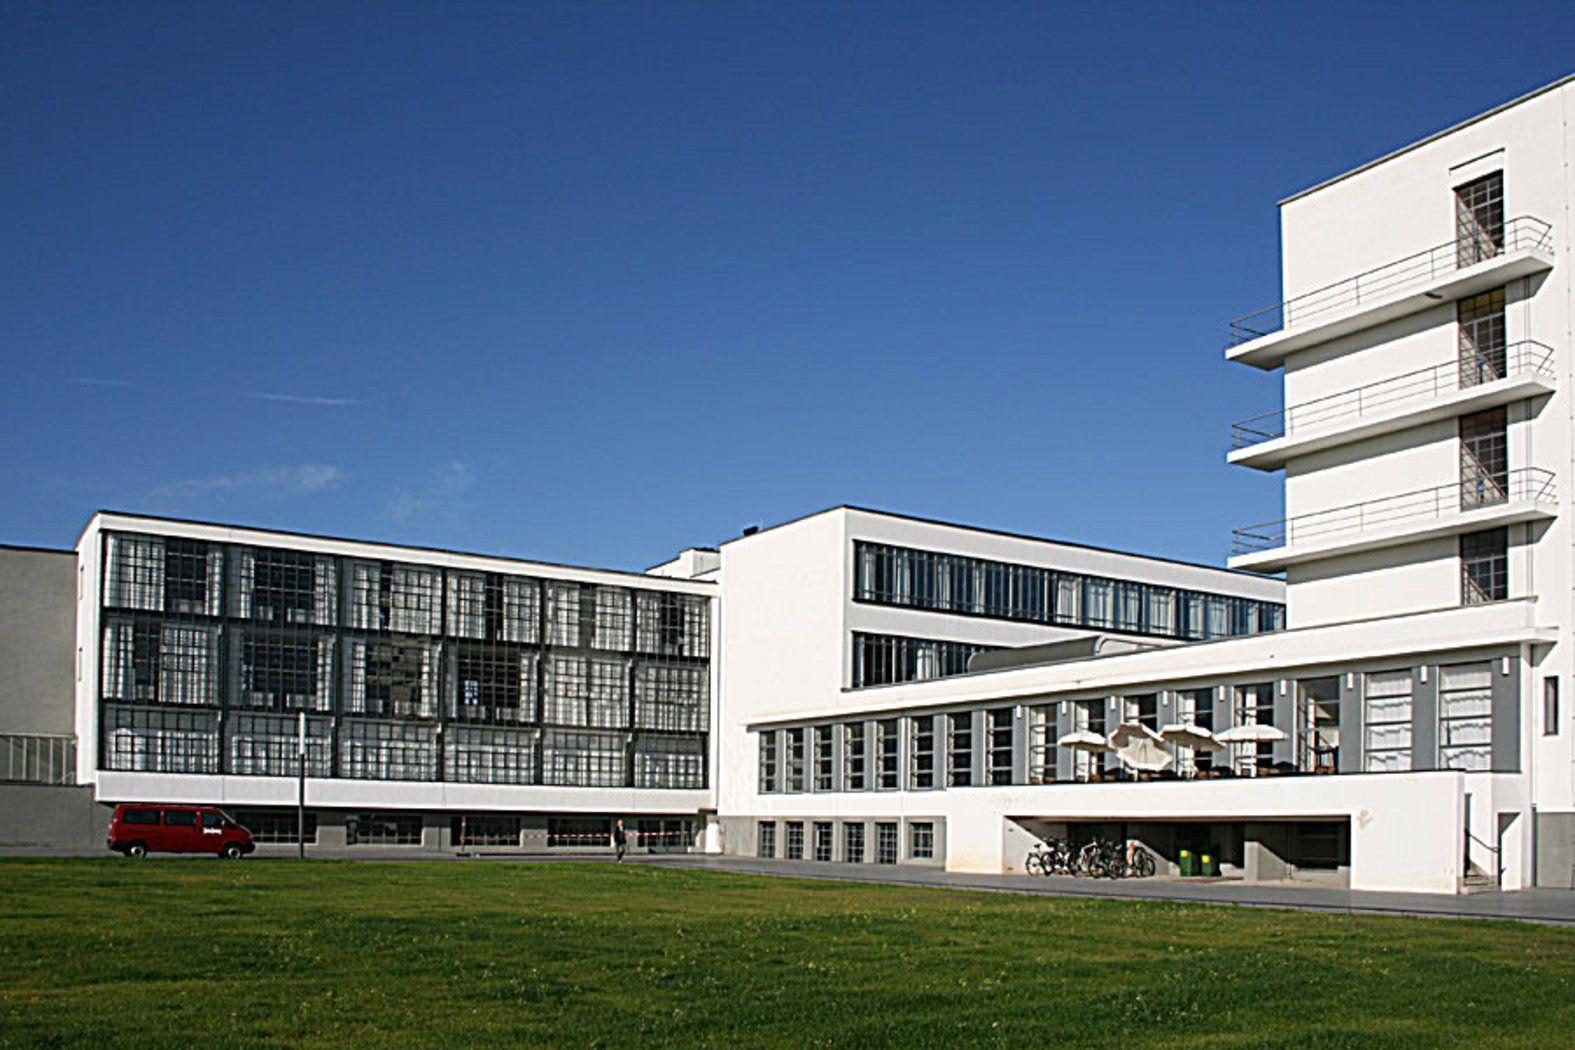 Walter Gropius Bauhaus Building Dessau, Germany 1925